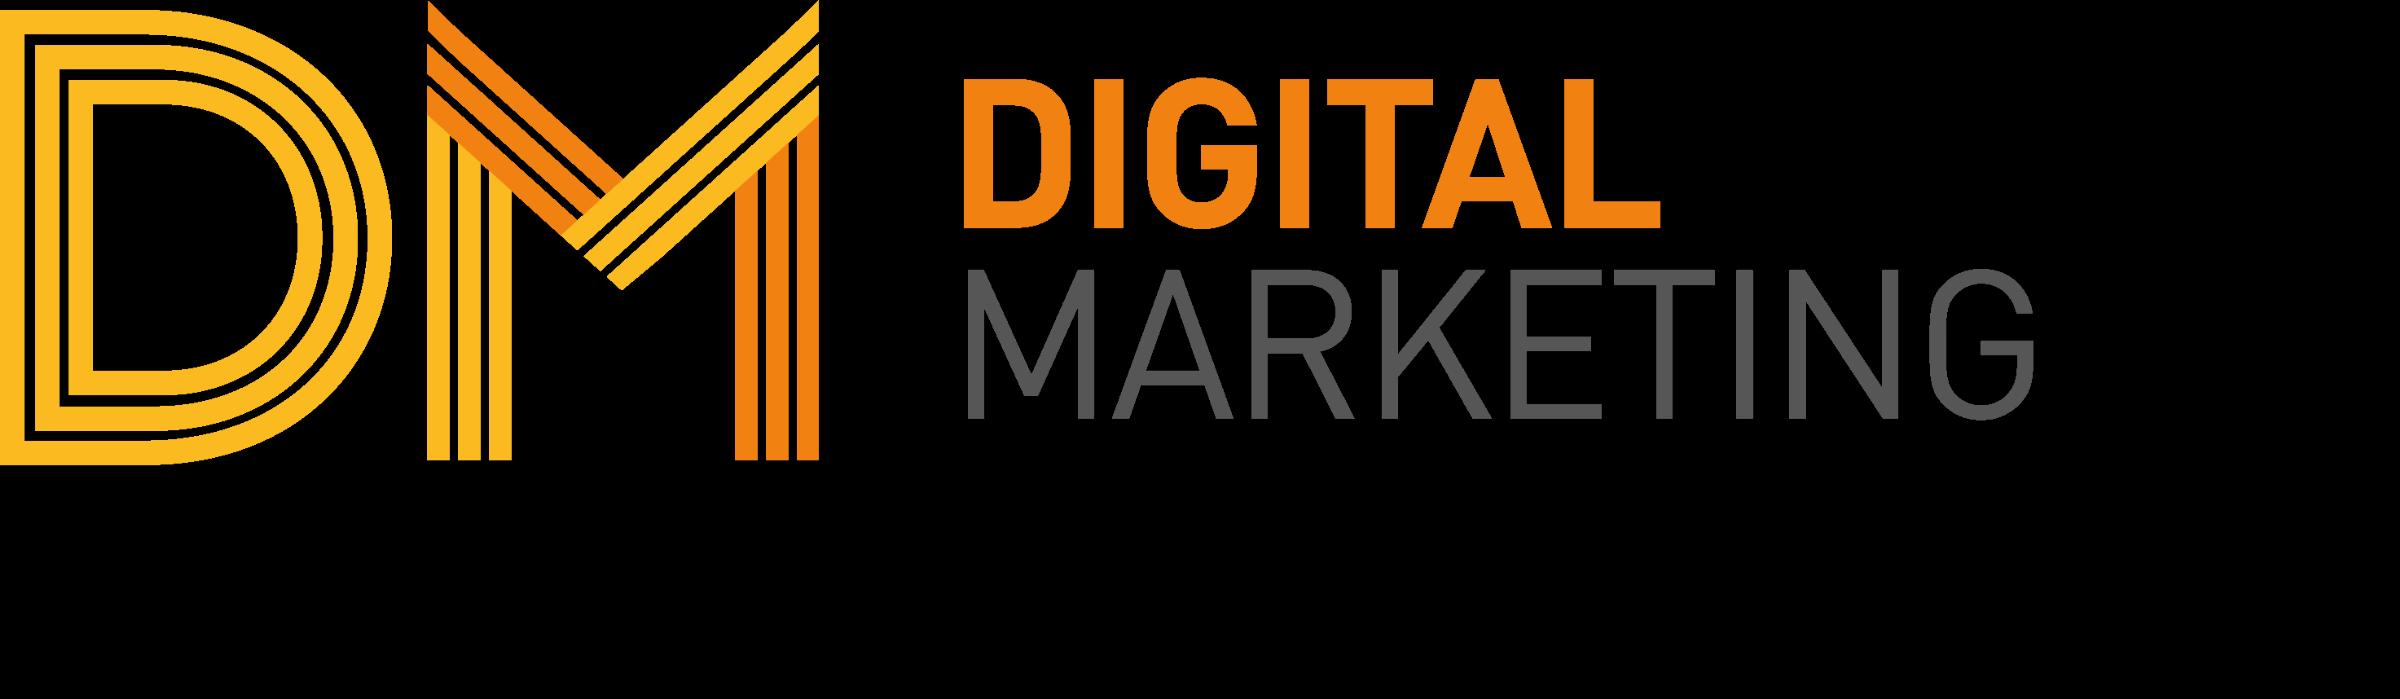 Digital Marketing Online Series